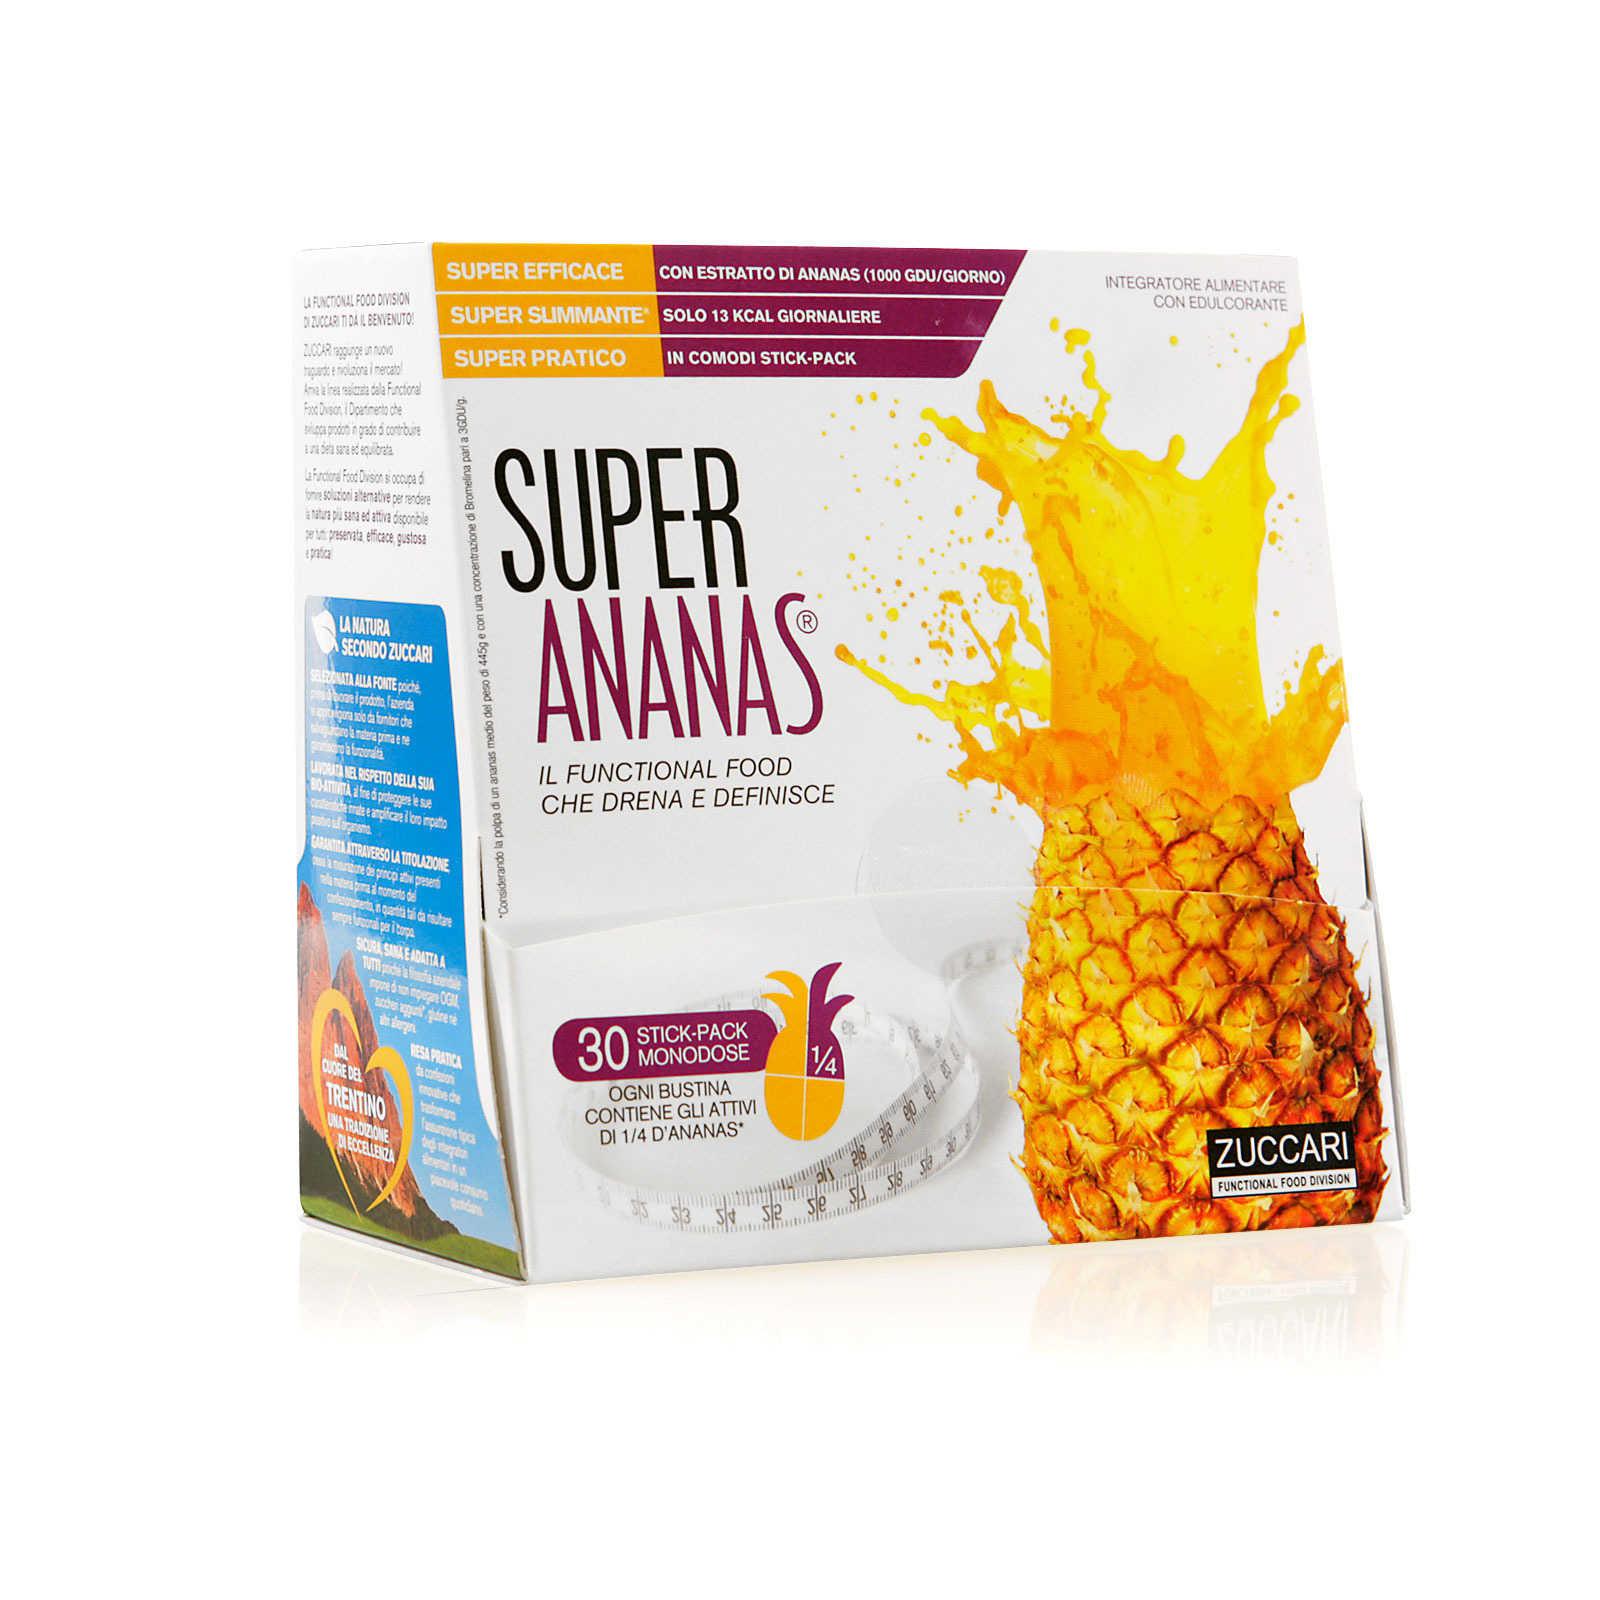 Zuccari - Super Ananas